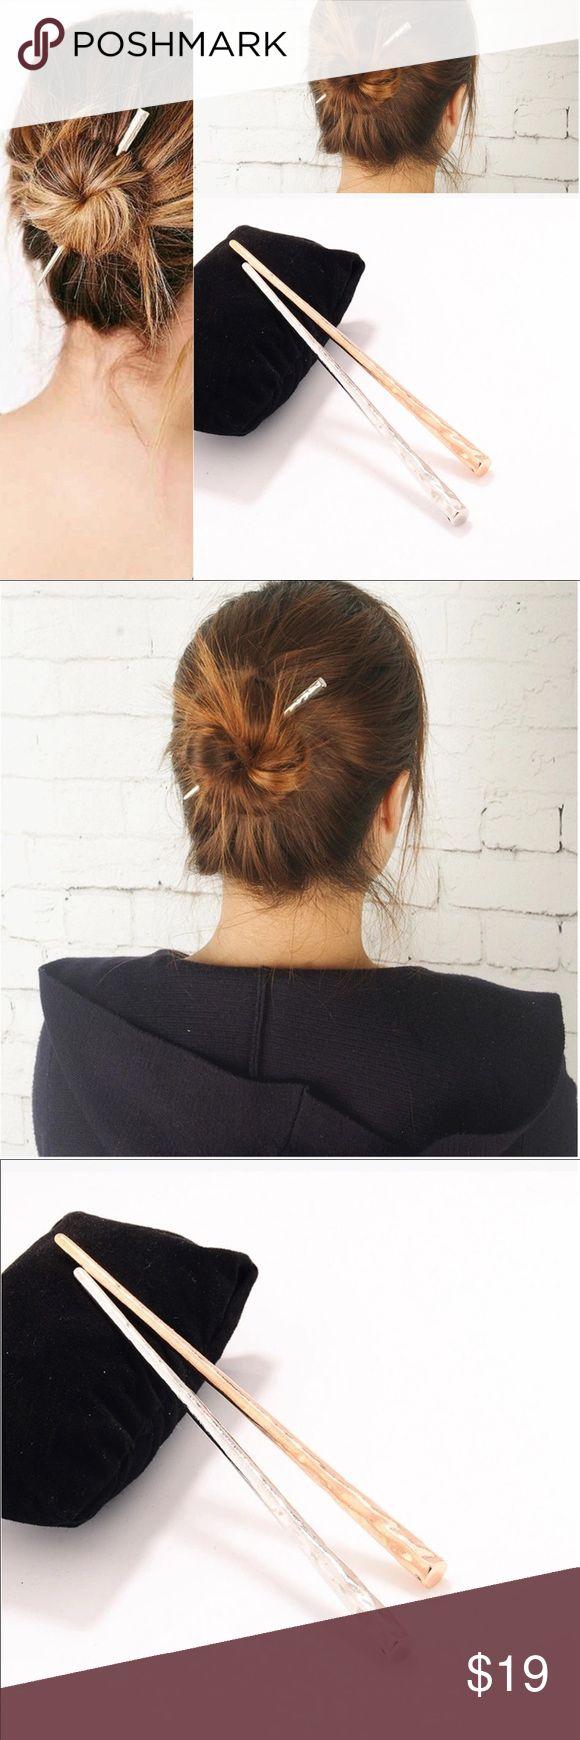 🛒Coming 1PCS Chopstick Hair Accessories Hairpin 1PCS Geometric Hair Clasp Alloy Chopstick Hair Stick Accessories Punk Hairpin Jewelry Queen Esther Etc Accessories Hair Accessories